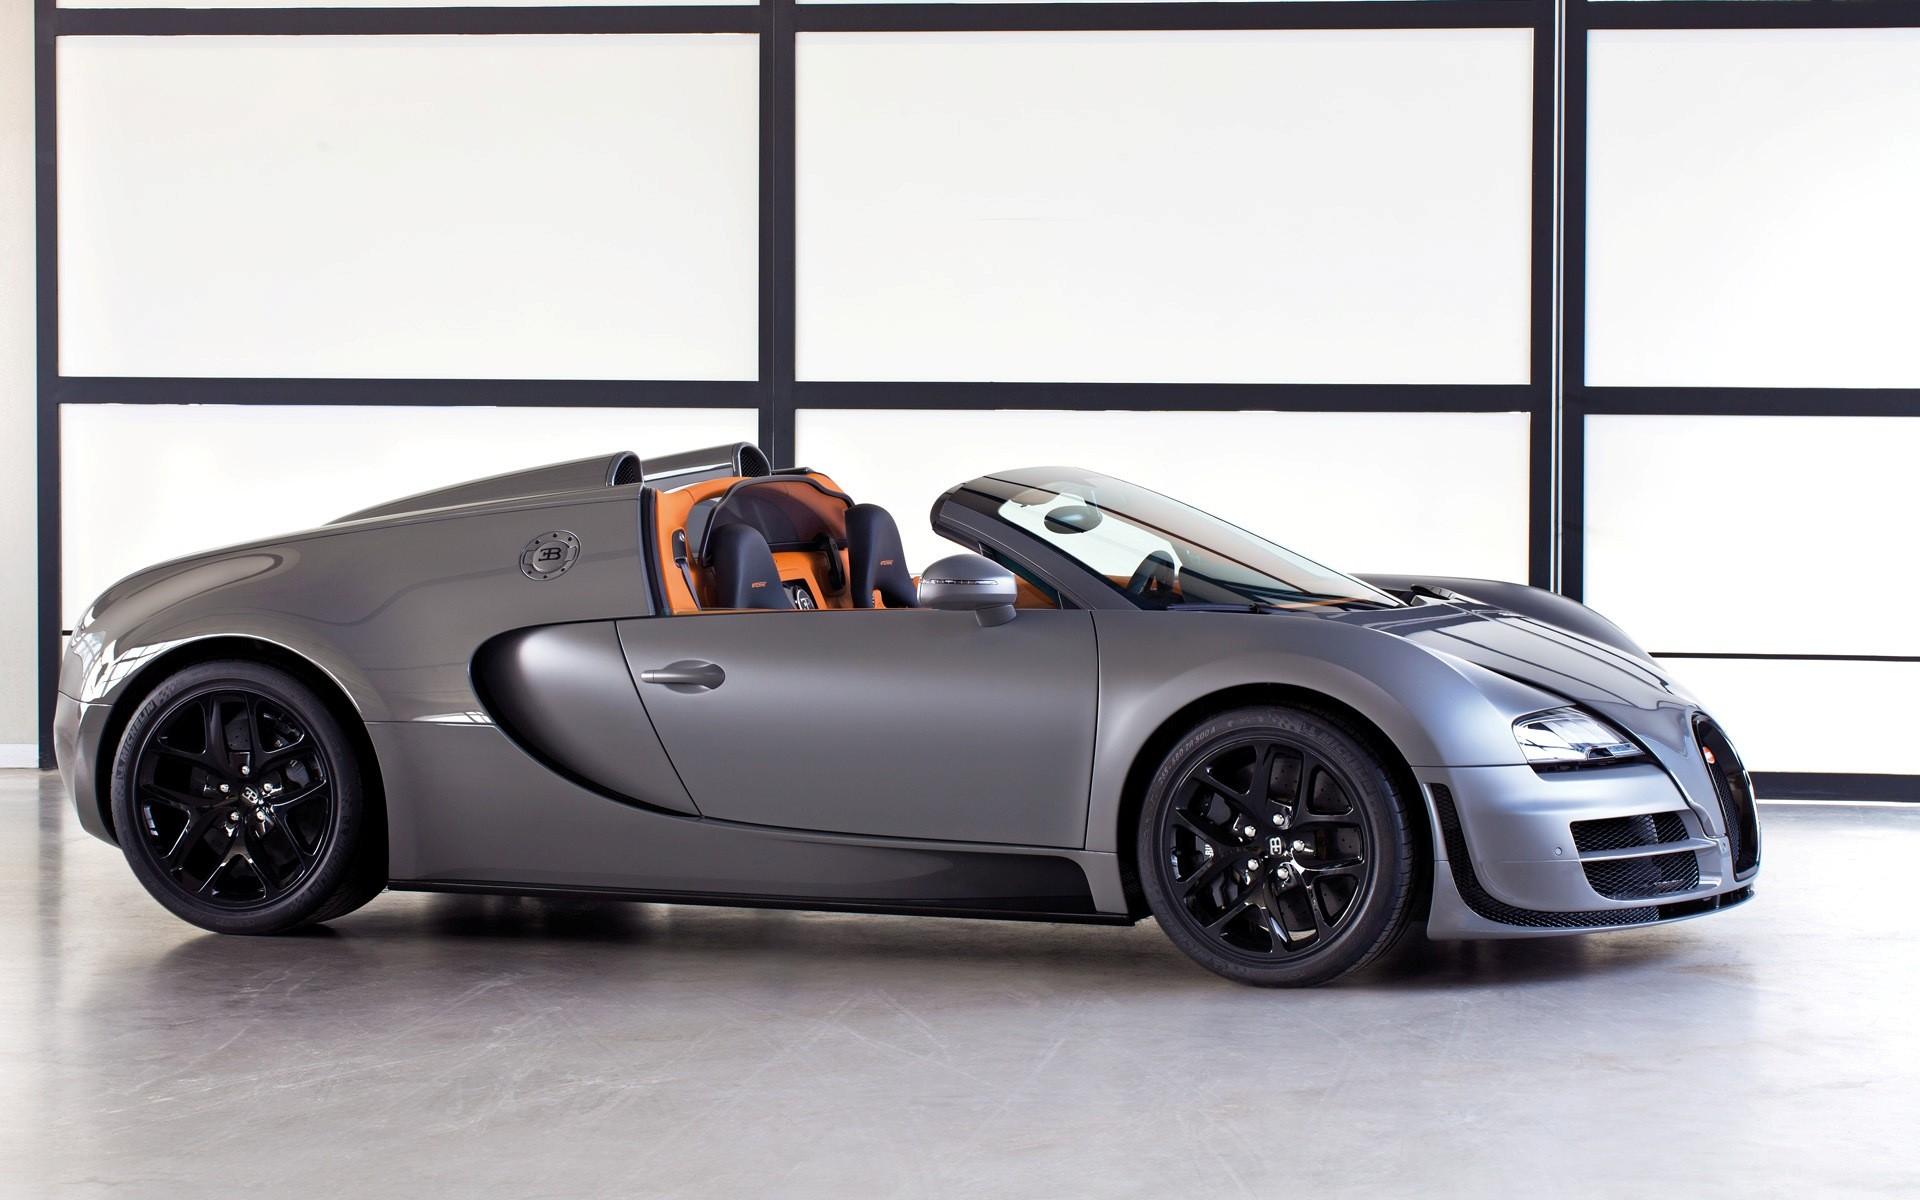 car-vehicle-sports-car-Bugatti-Bugatti-Veyron-Bugatti-Veyron-Grand-Sport-Vitesse-Bugatti-Veyron-16-4-Grand-Sport-Vitesse-wheel-supercar-1920x1200-px-land-vehicle-automotive-design-automotive-exterior-automobile-make-model-car-luxury-vehicle-628752 Astounding Xe Bugatti Veyron Grand Sport Vitesse Cars Trend